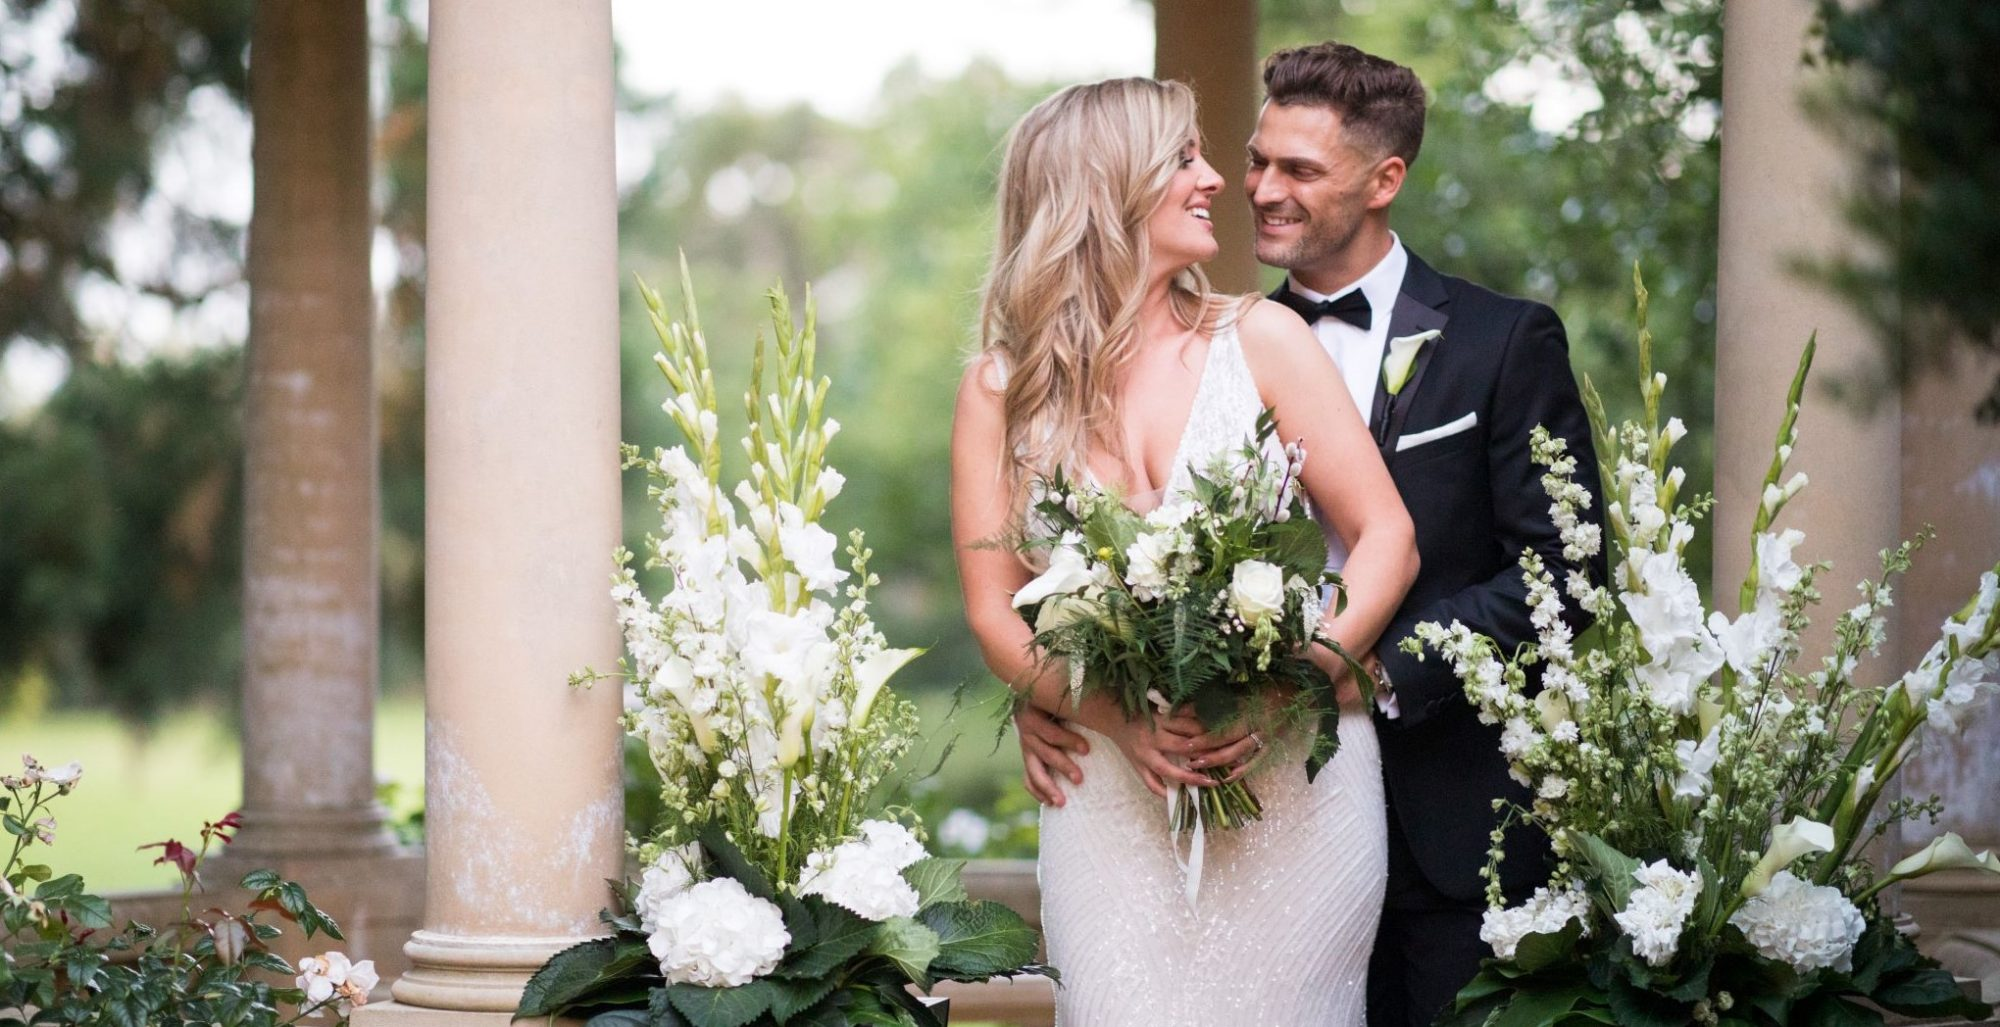 smiling bride groom floral arrangements kilworth house hotel gardens north kilworth leicestershire oxford wedding photographers